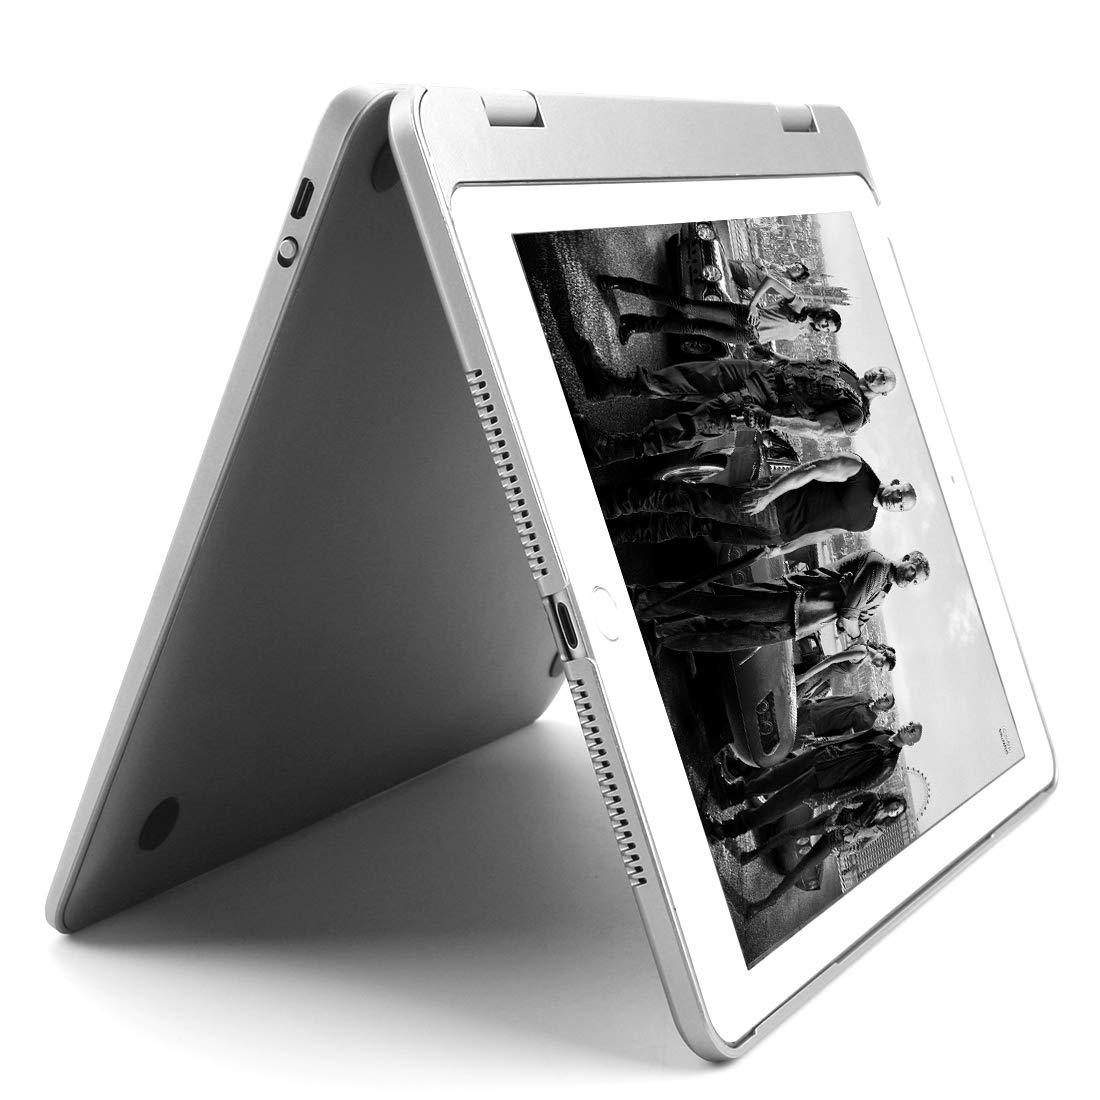 elecfan iPad Keyboard Case 6th Generation 9.7, Colorful Backlit Wireless/BT Keyboard with 180 Degree Flip & Smart Sleep/Wake Stand Cover for 2018/2017 New iPad 9.7 inch/iPad Pro 9.7/iPad Air 2/1, Black